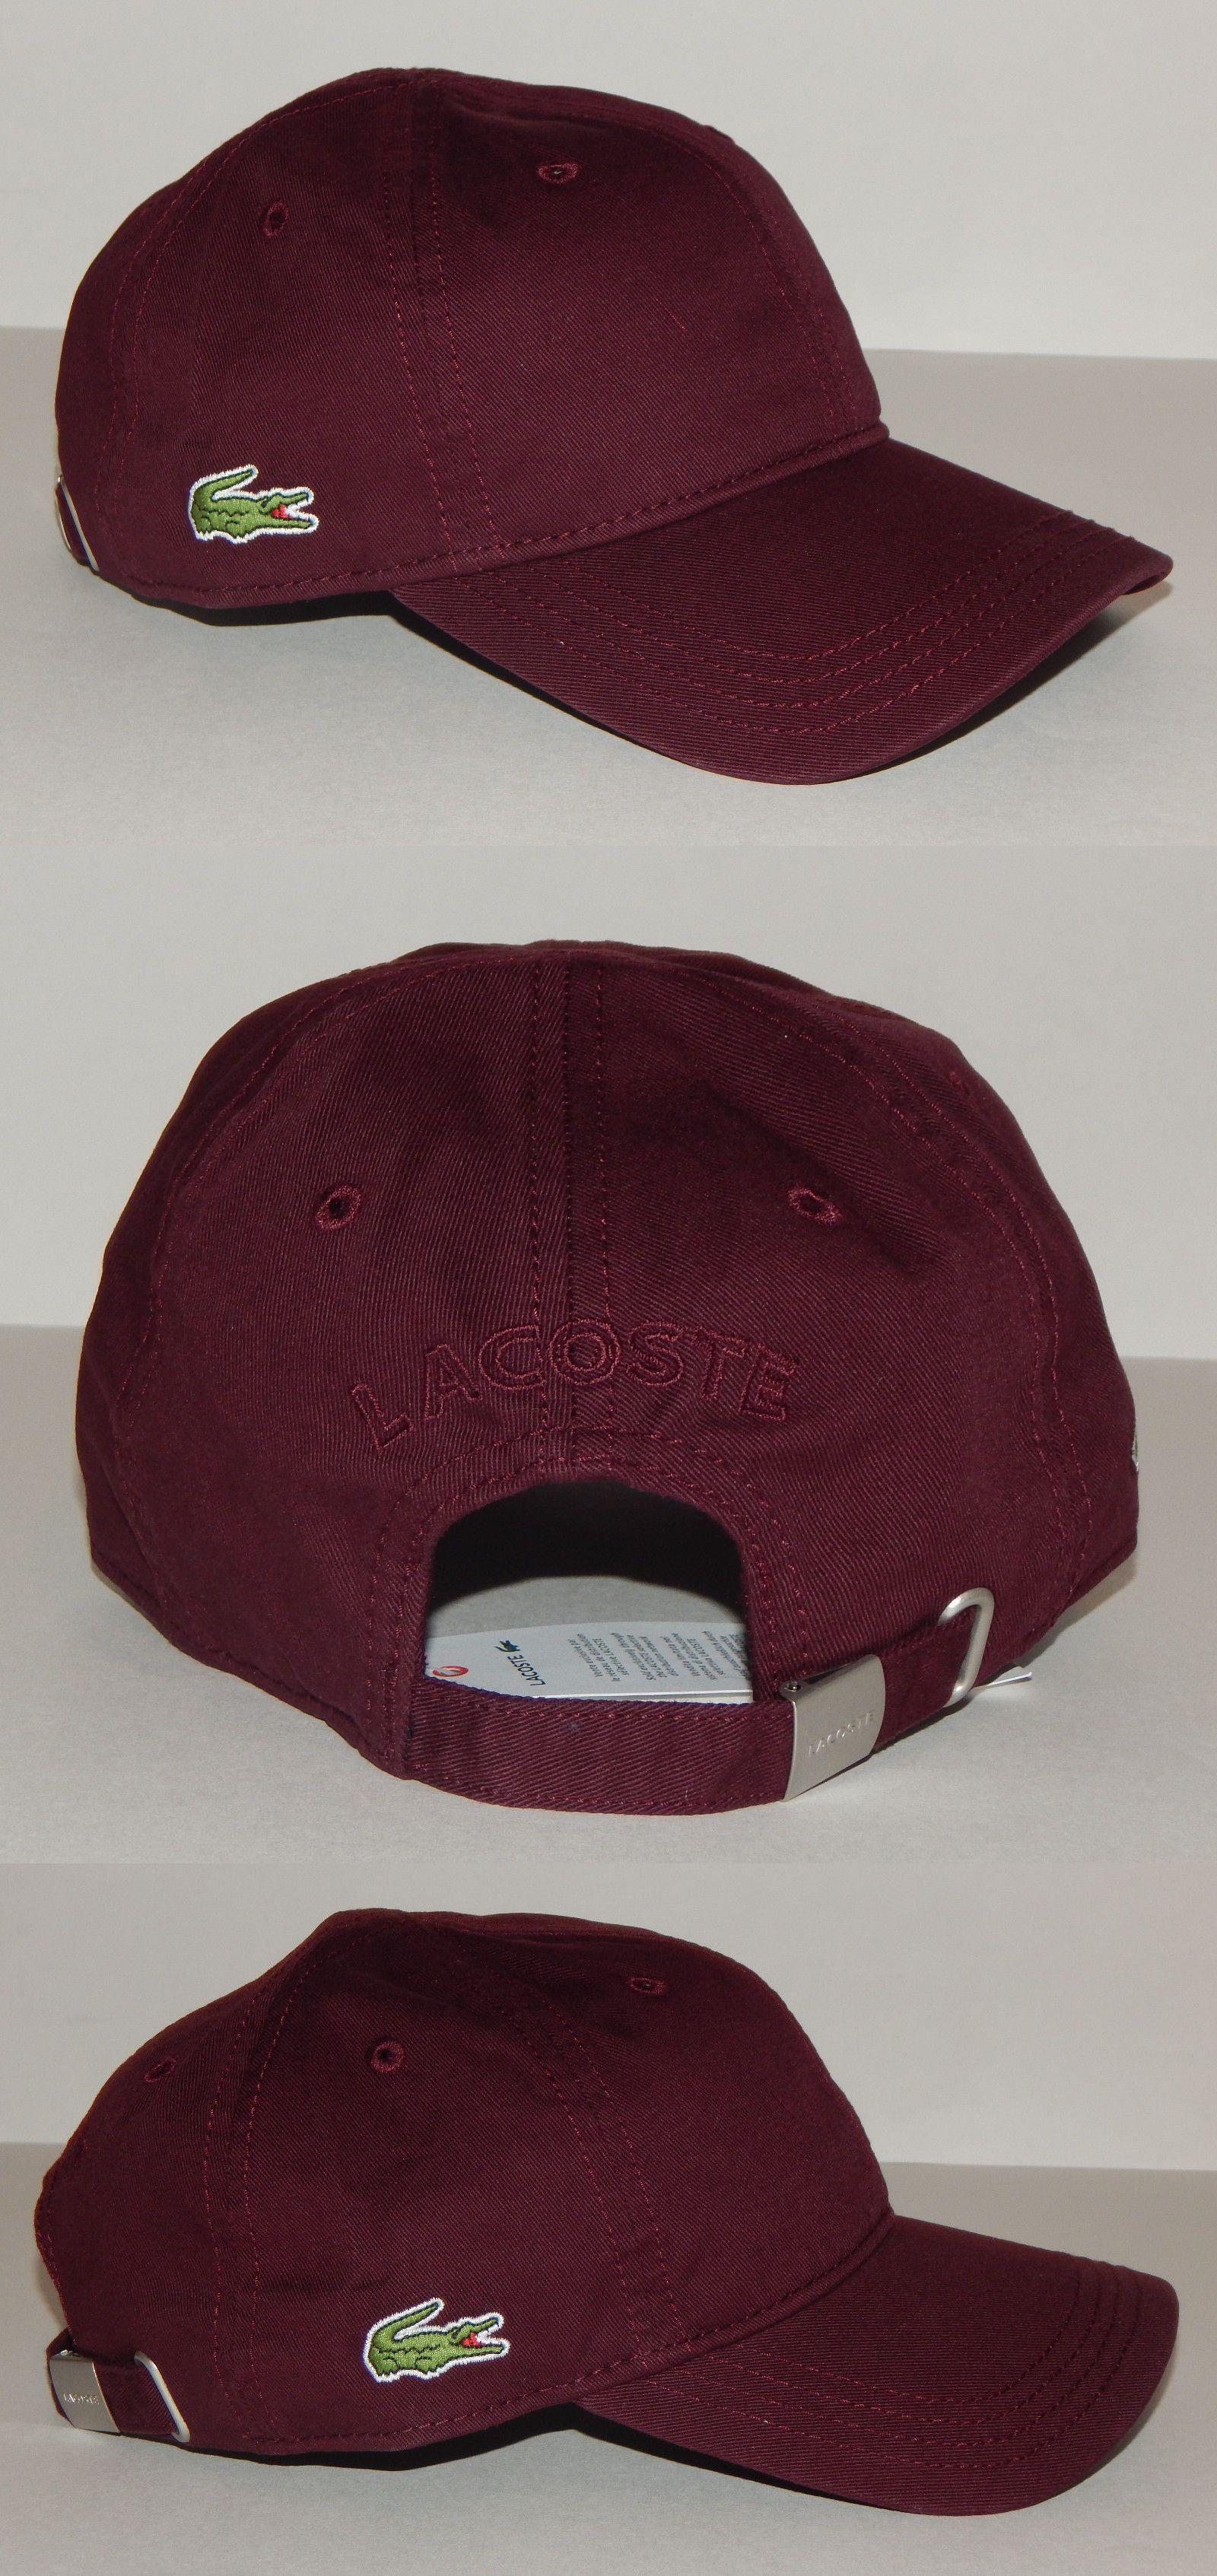 5a5dc34e14f Hats 52365  Lacoste Classic Croc Adjustable Gabardine Baseball Tennis Hat  Cap Burgundy -  BUY IT NOW ONLY   33.99 on eBay!